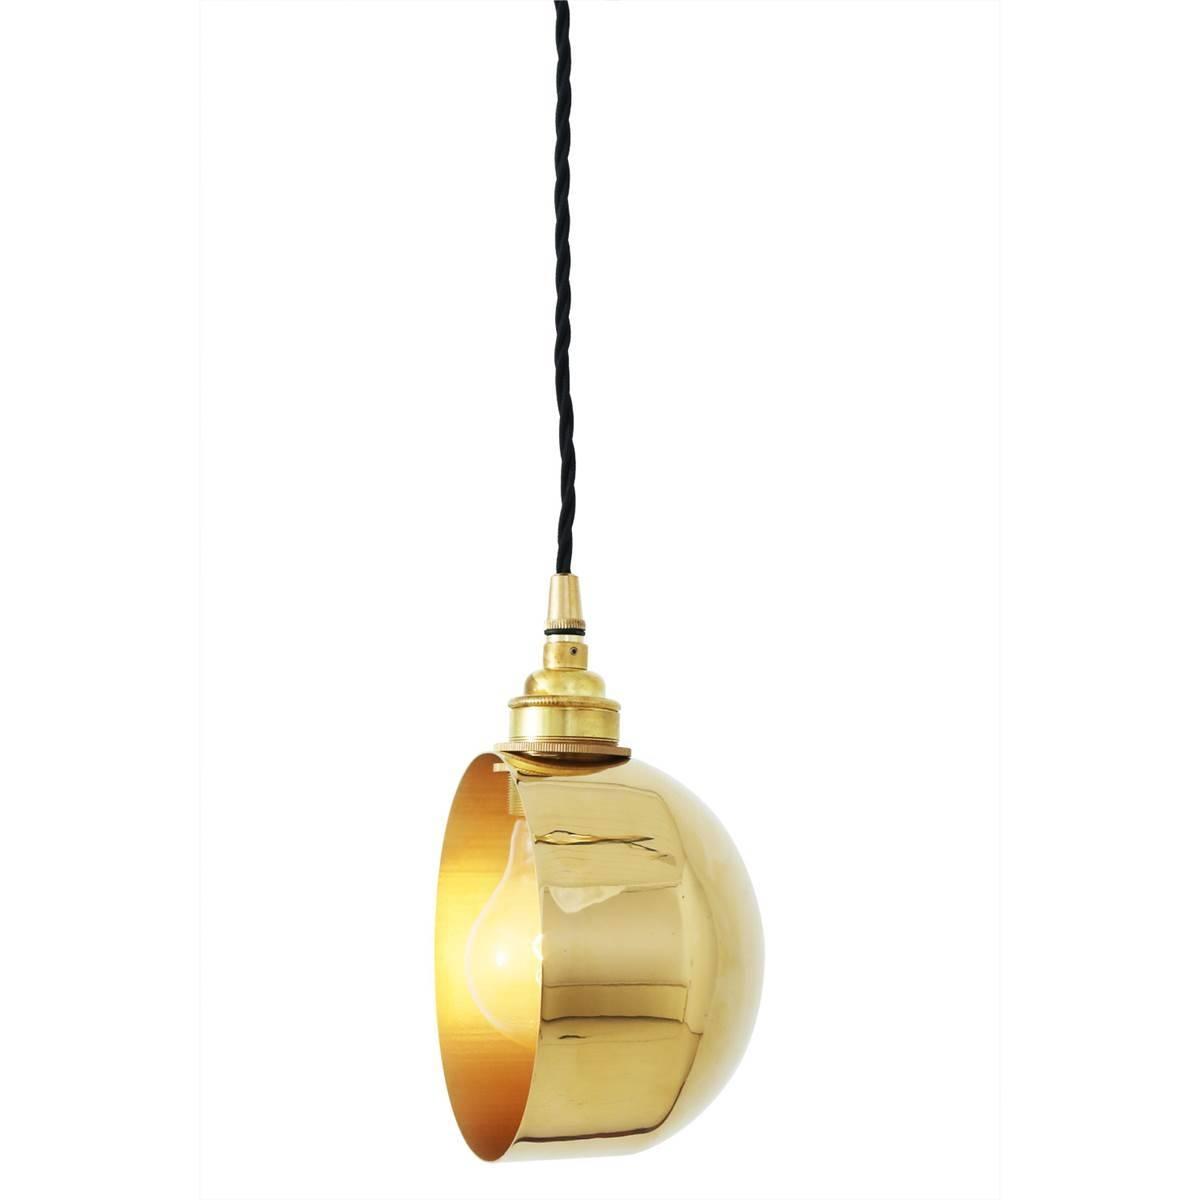 Bogota Modern Pendant Light | Mullan Lighting in Quirky Pendant Lights (Image 7 of 15)